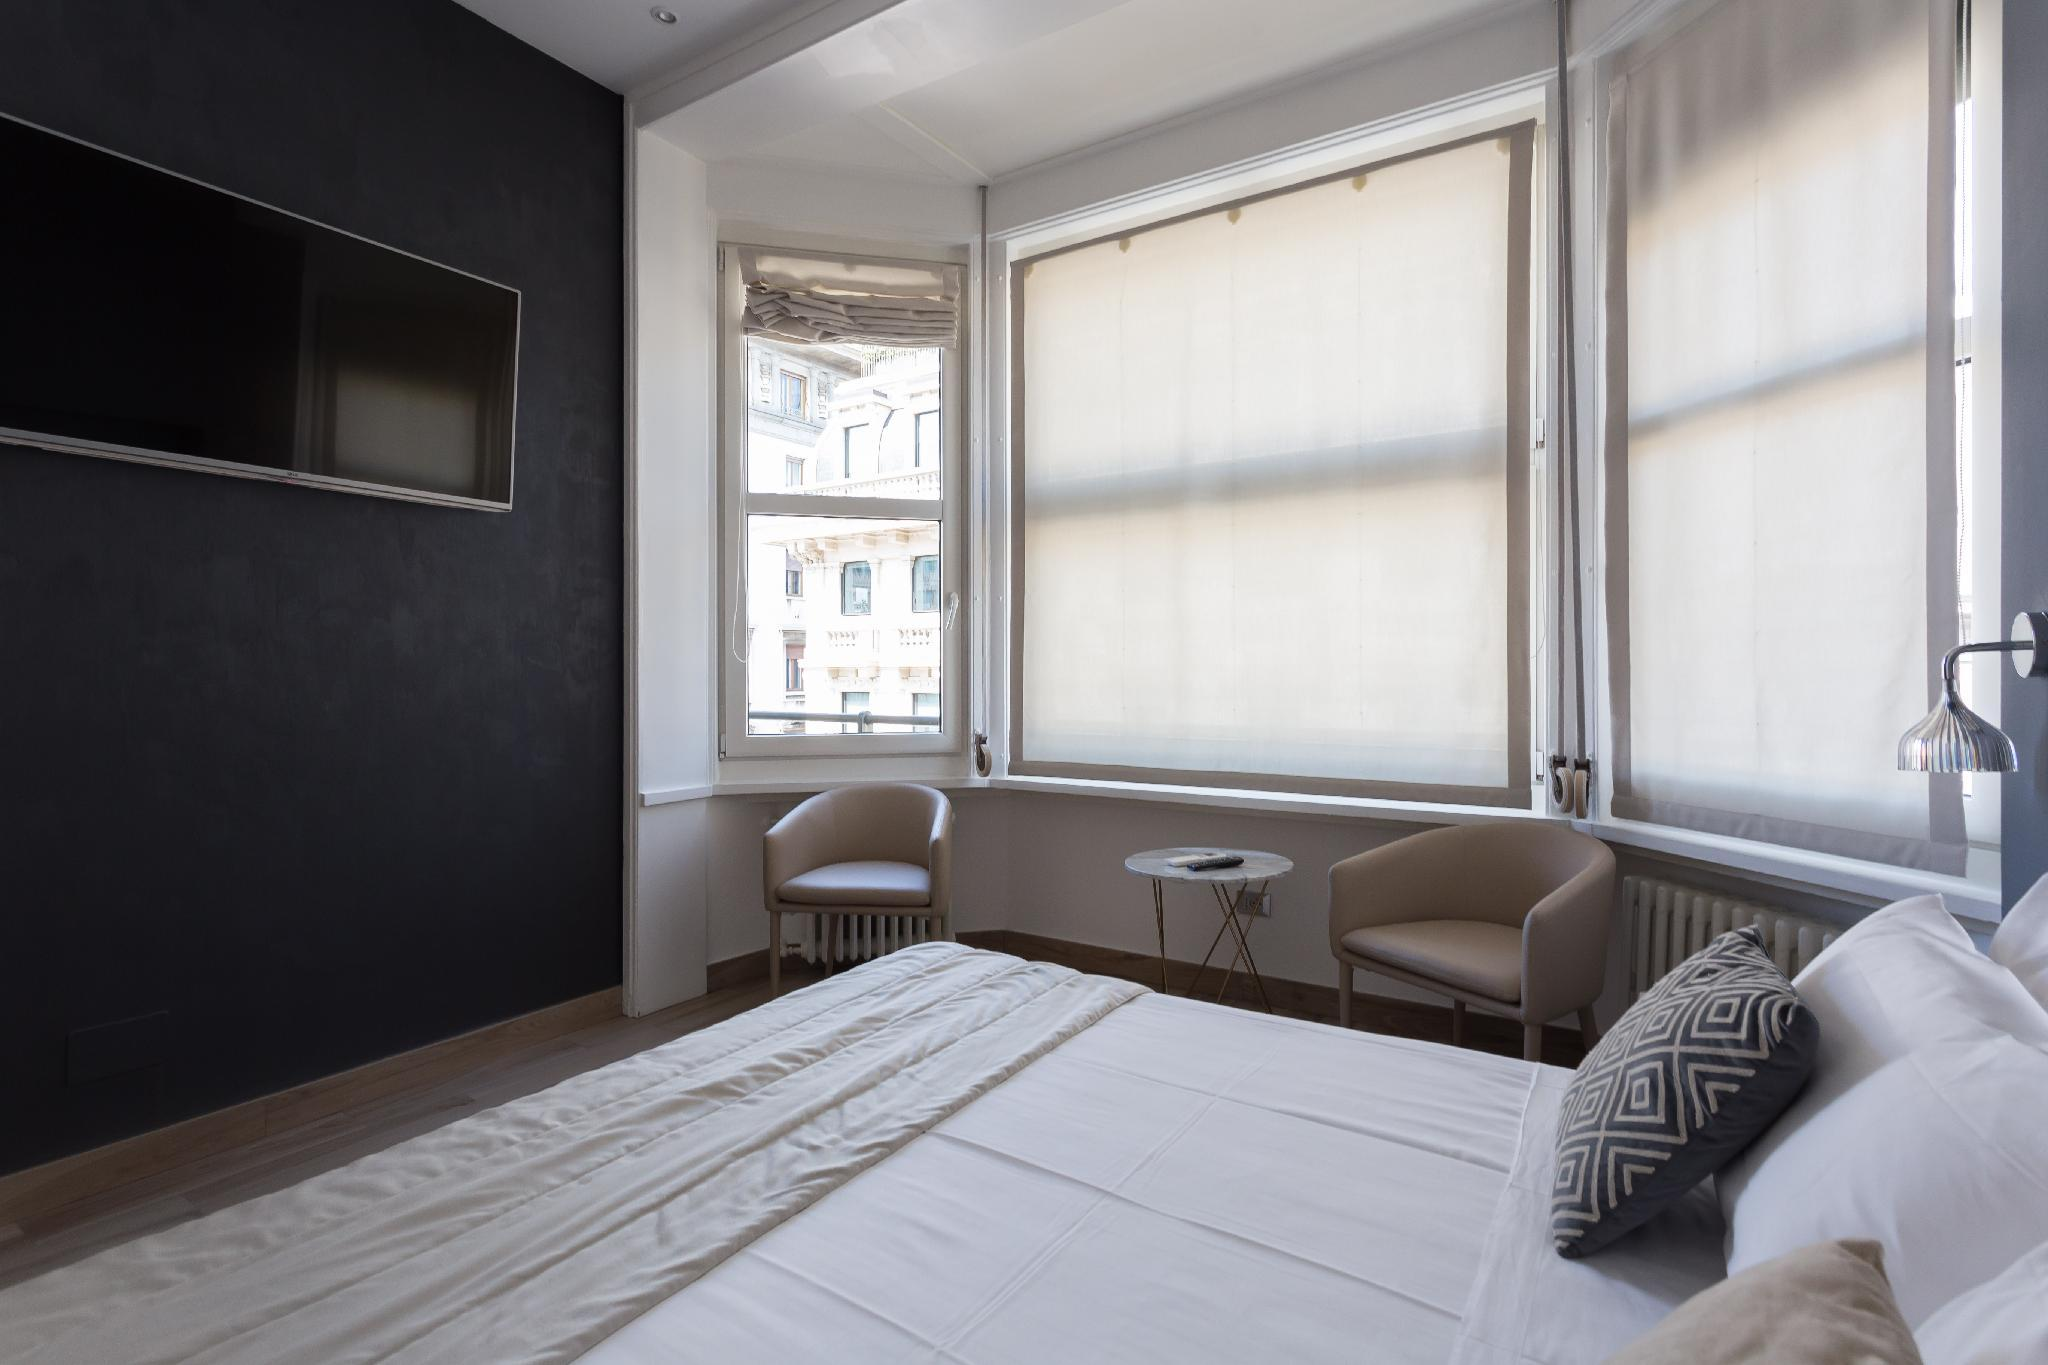 Appartamento Deluxe Con Balcone 403